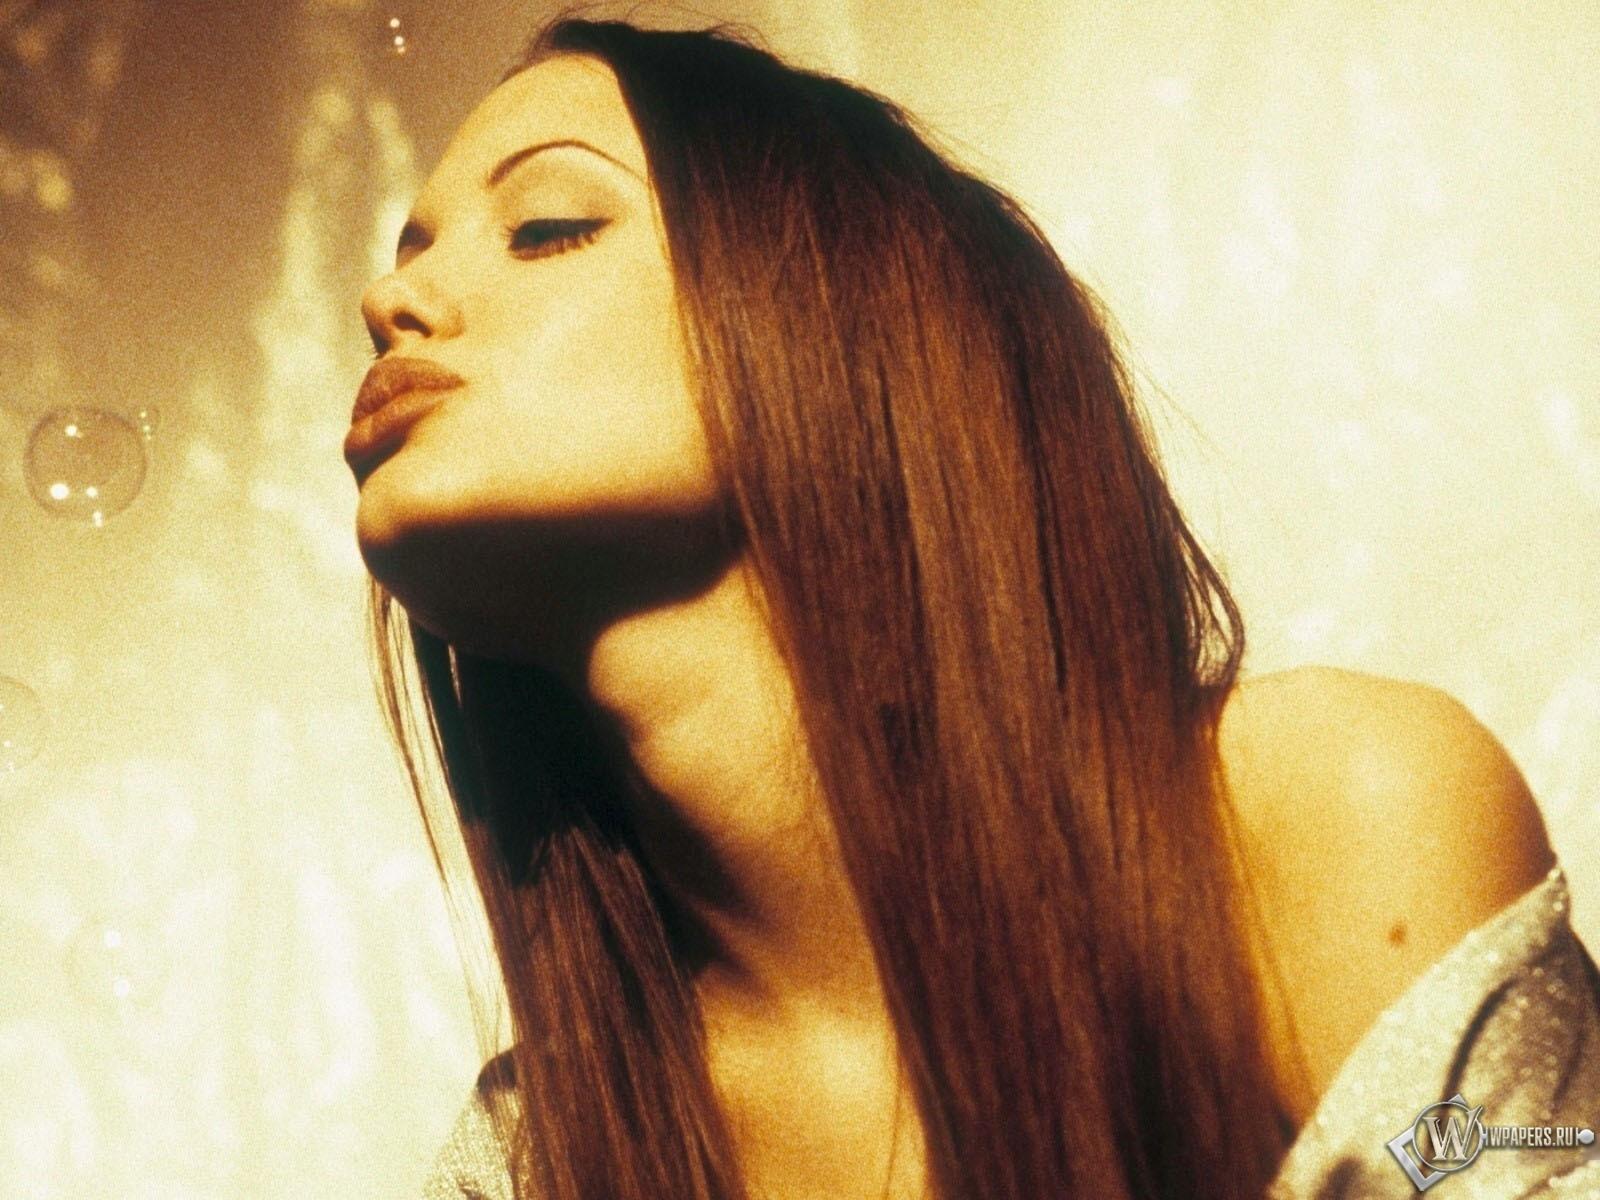 Анджелина Джоли и пузырьки 1600x1200